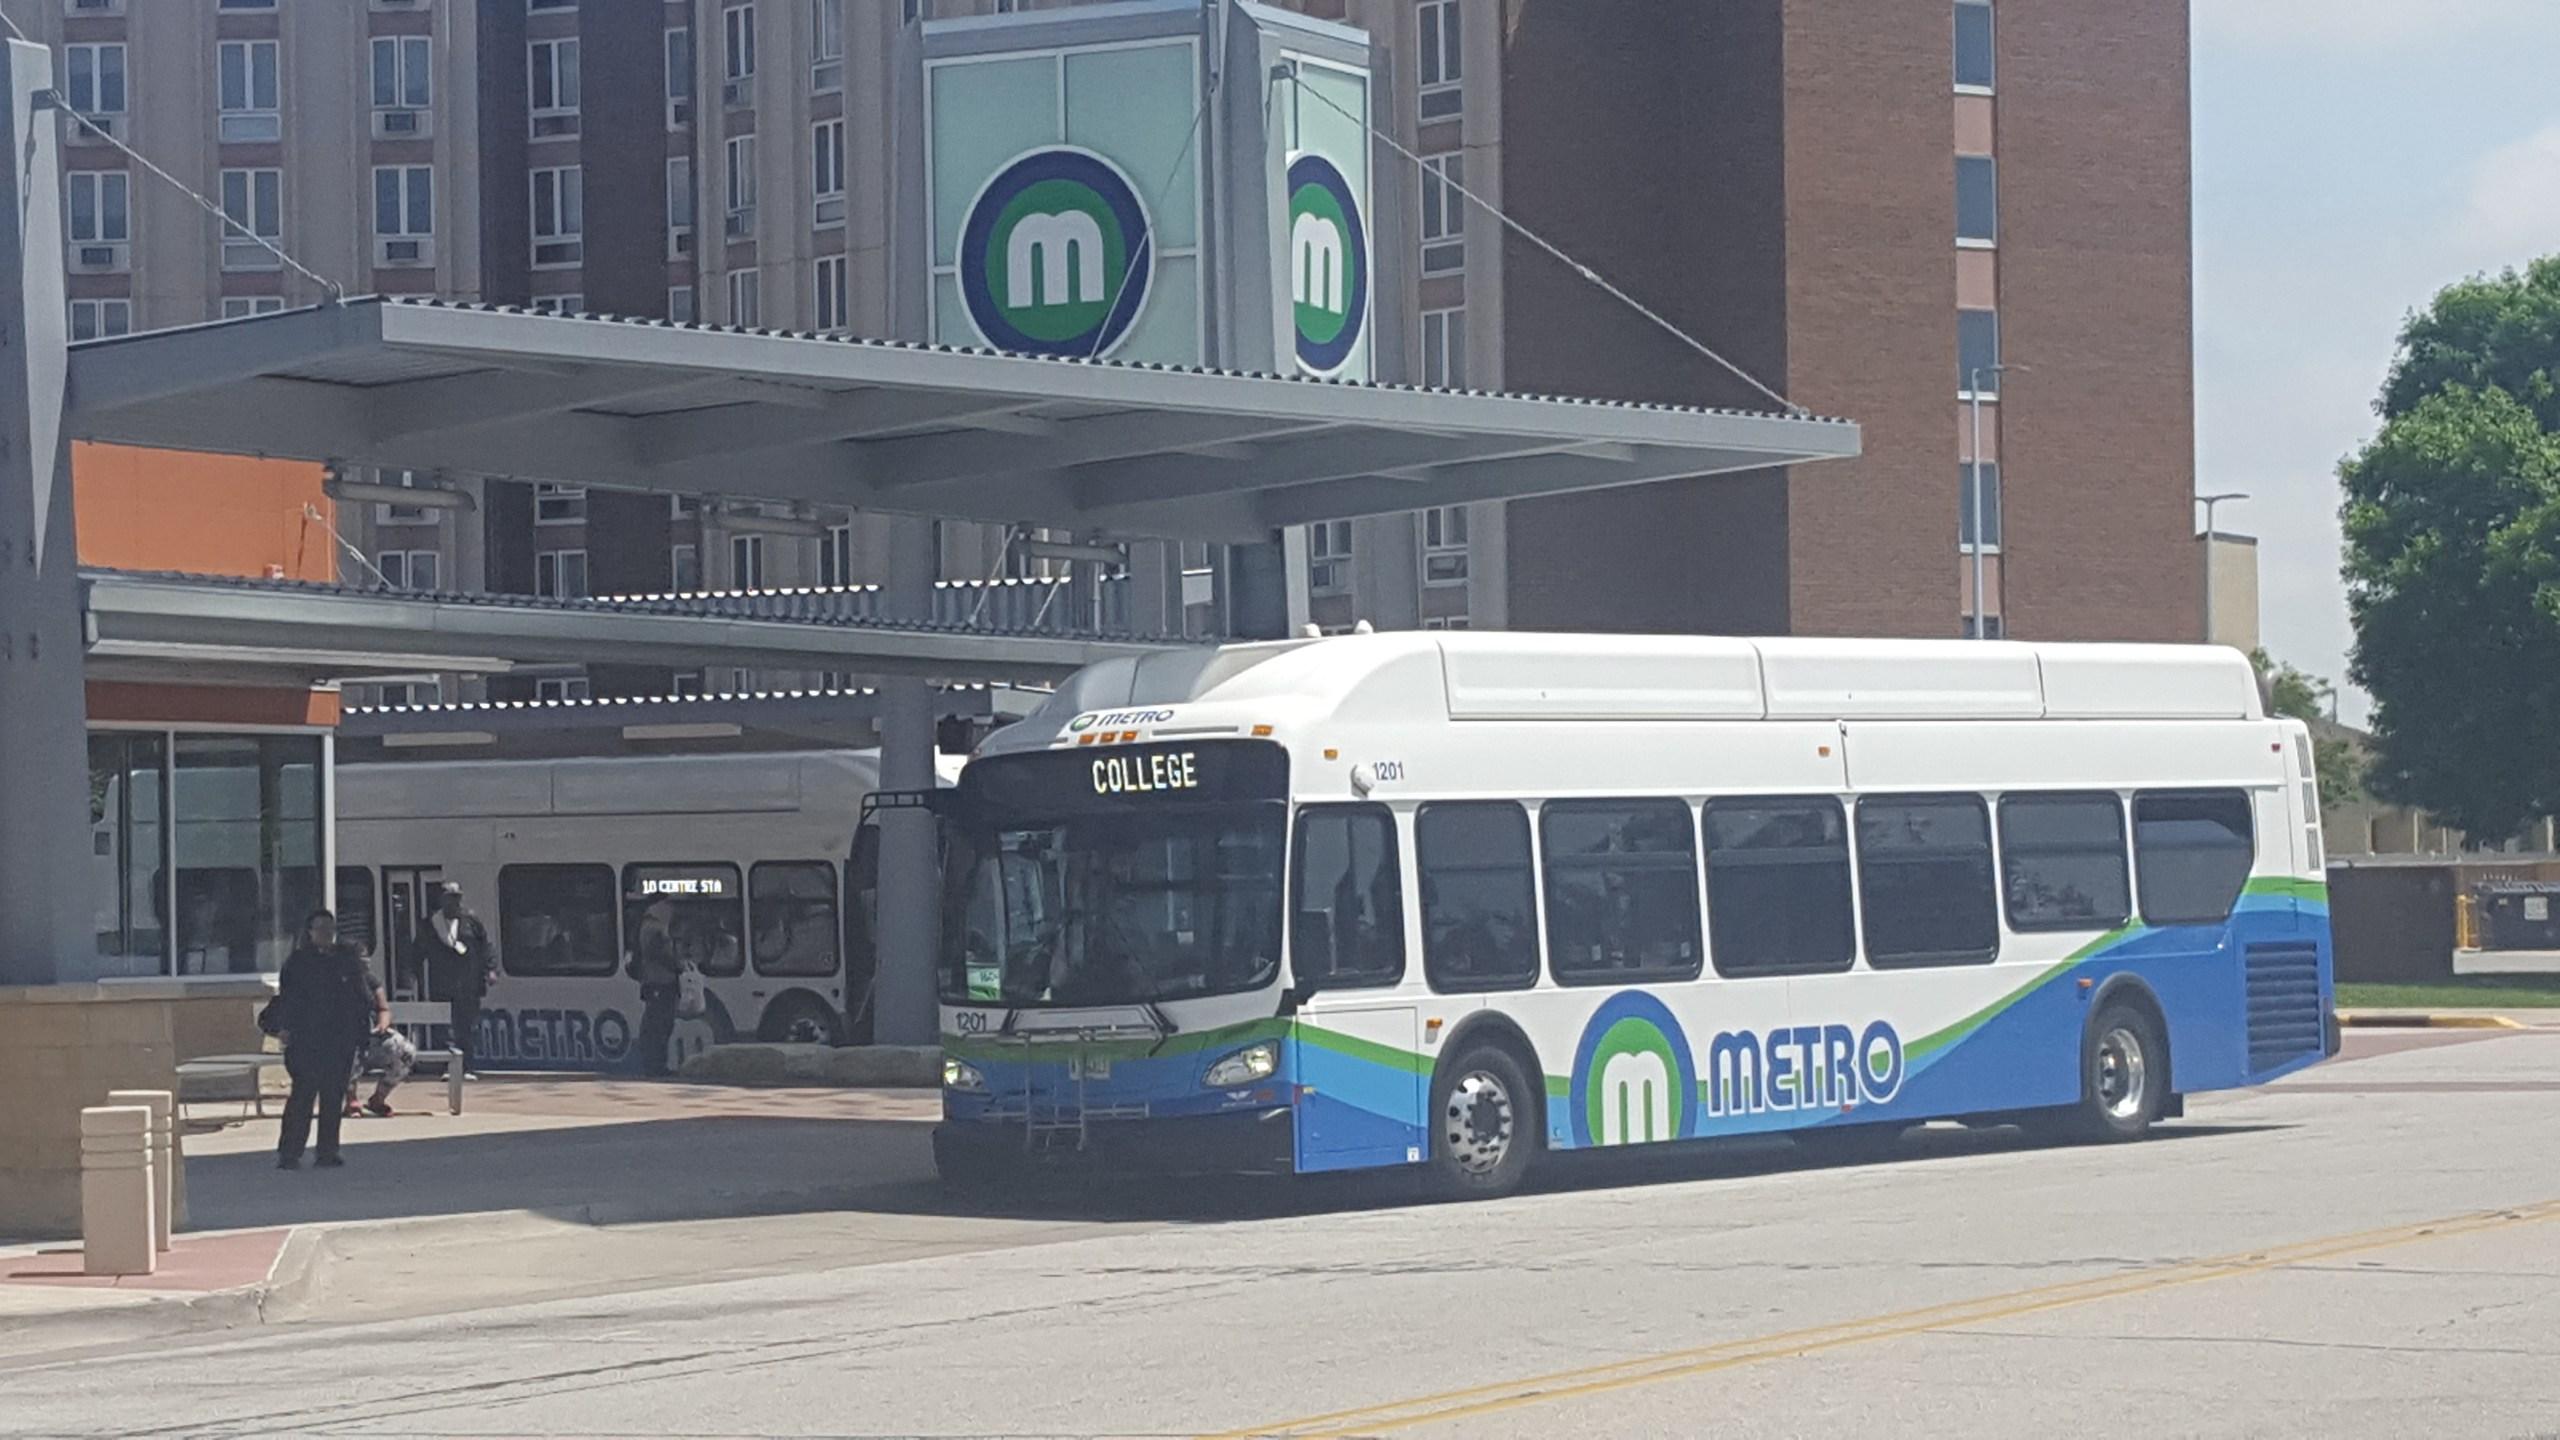 Metro bus in Rock Island on May 25, 2017